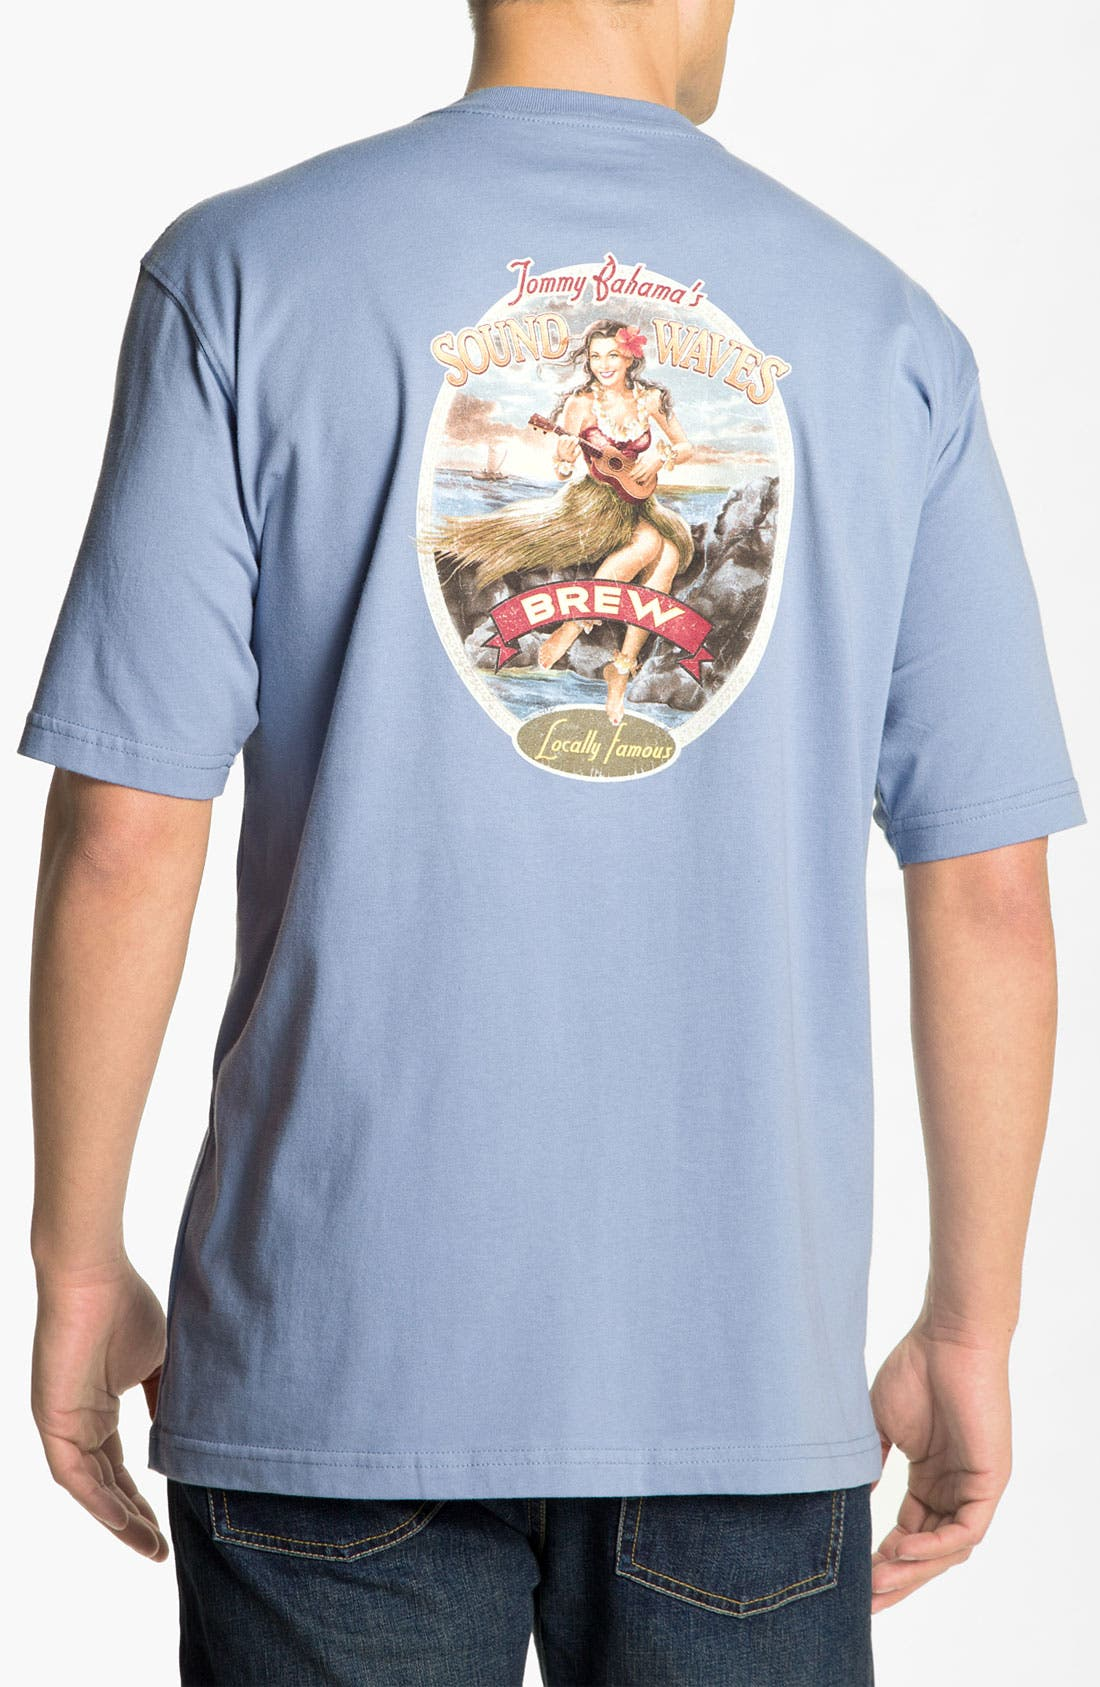 Main Image - Tommy Bahama 'Sound Waves Brew' T-Shirt